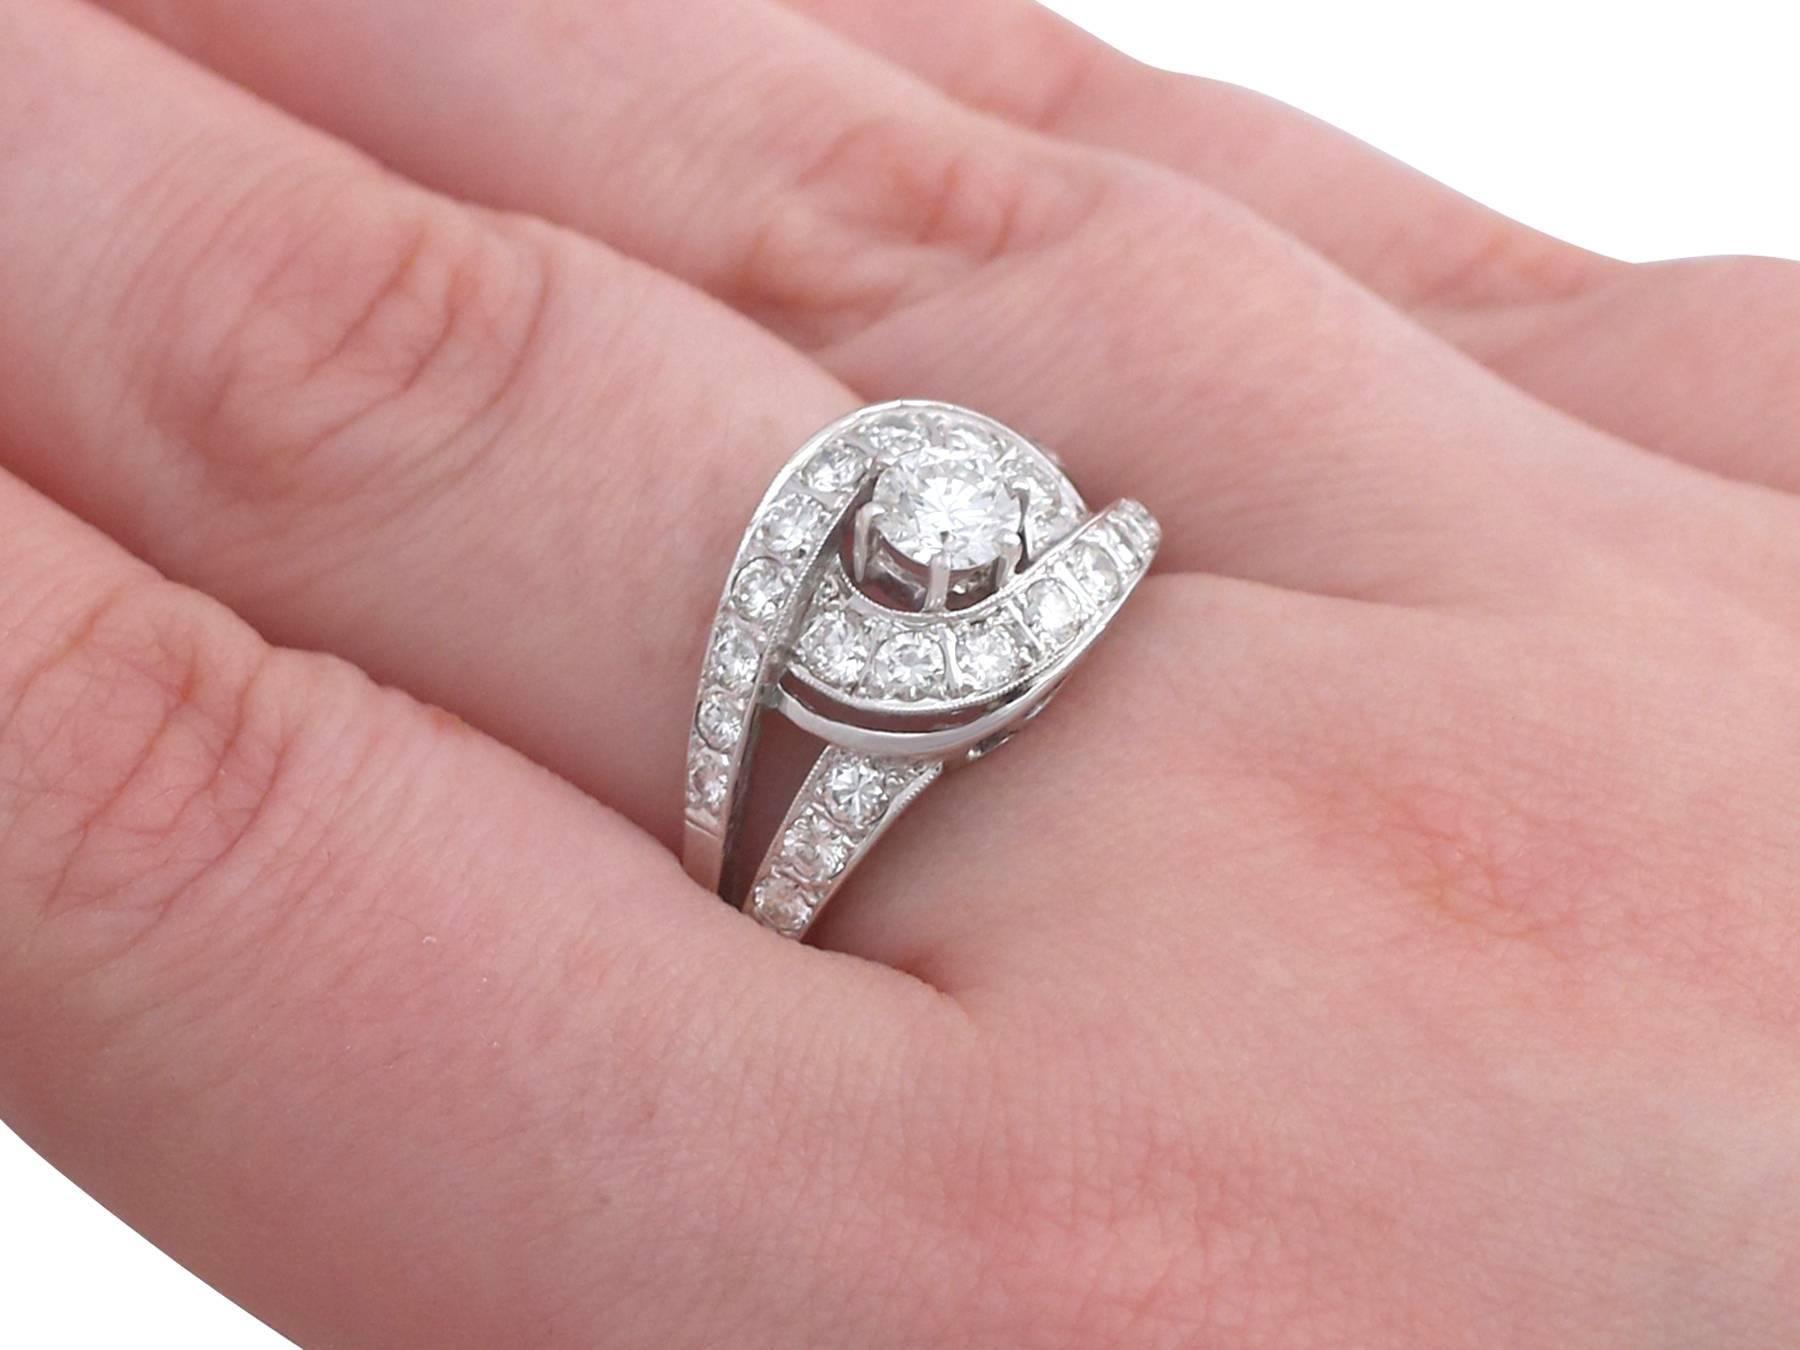 1960s German 1.88 Carat Diamond and White Gold Dress Ring at 1stdibs